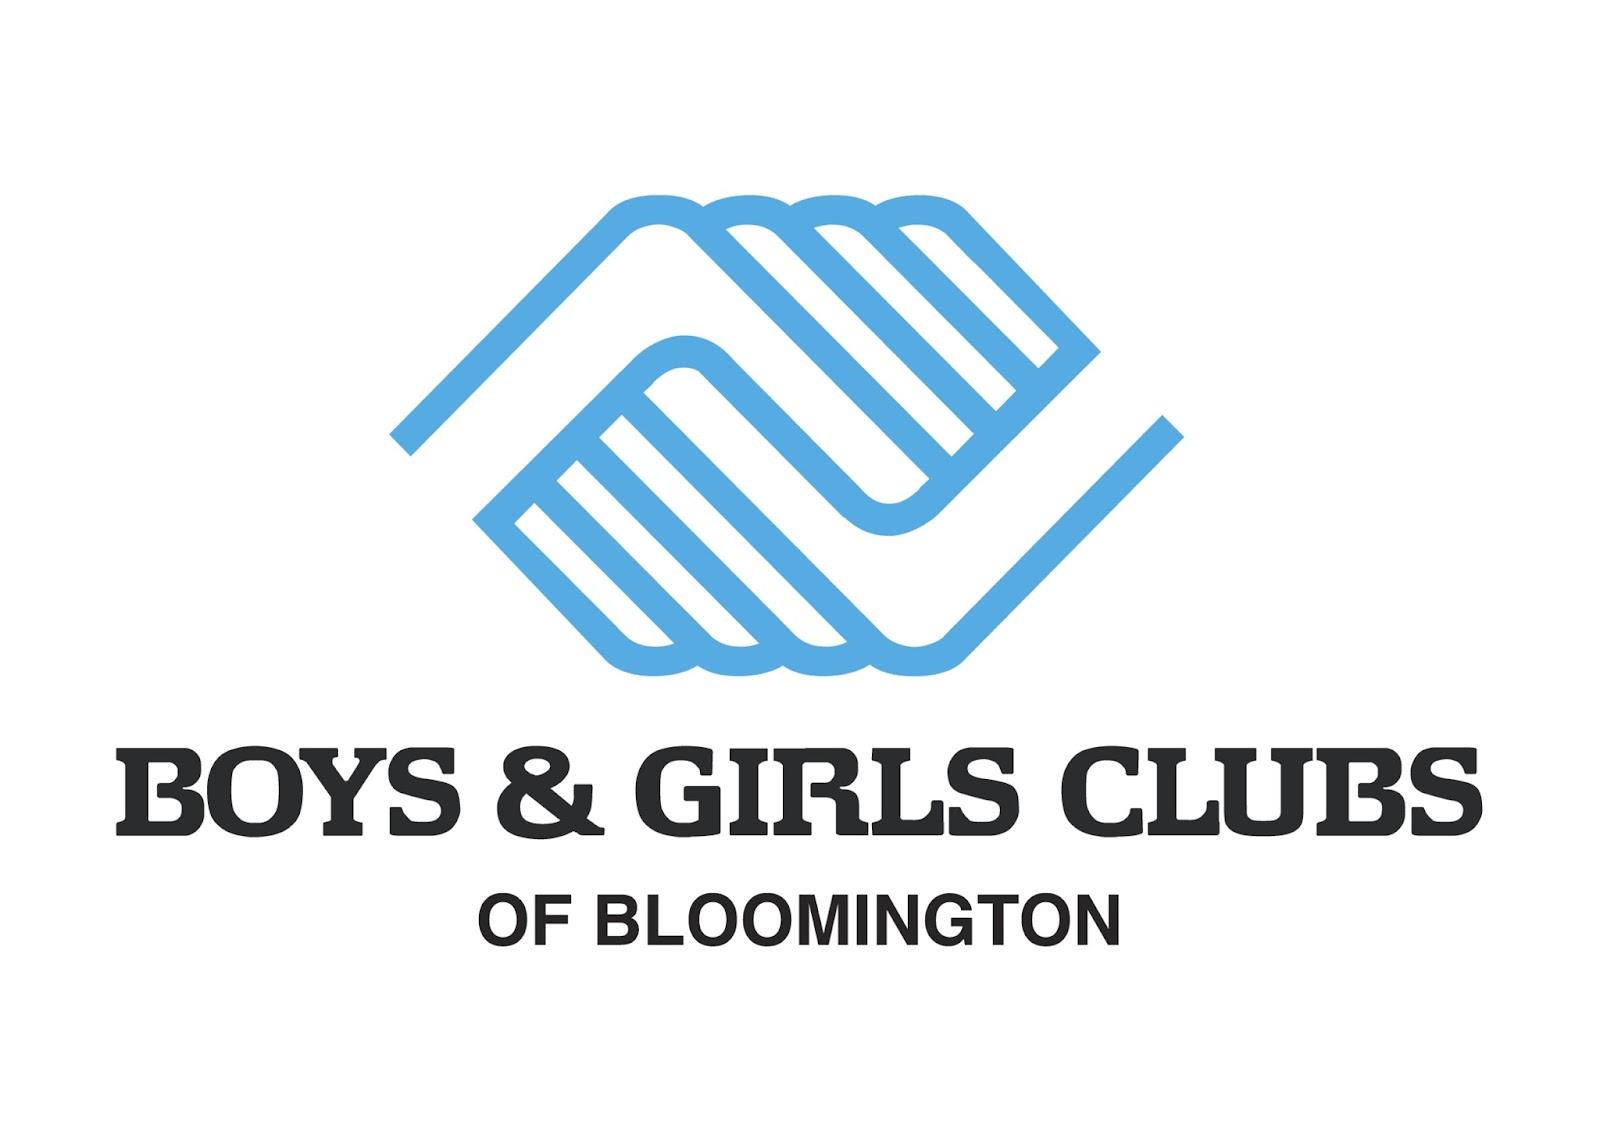 BGC_Logo_for_Print_(no_background).tif